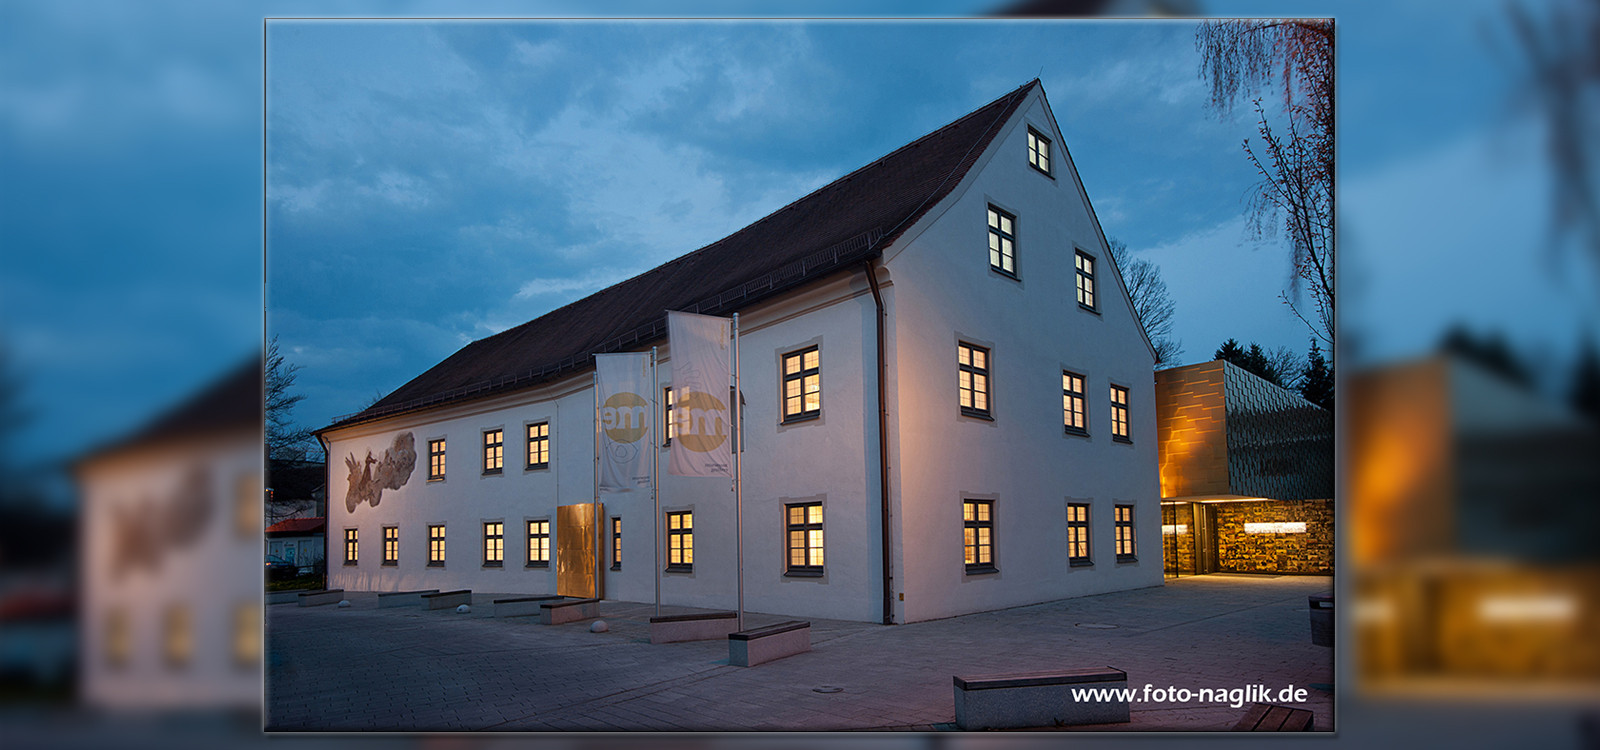 Naglik-Foto-Erding-Architektur-5 Kopie